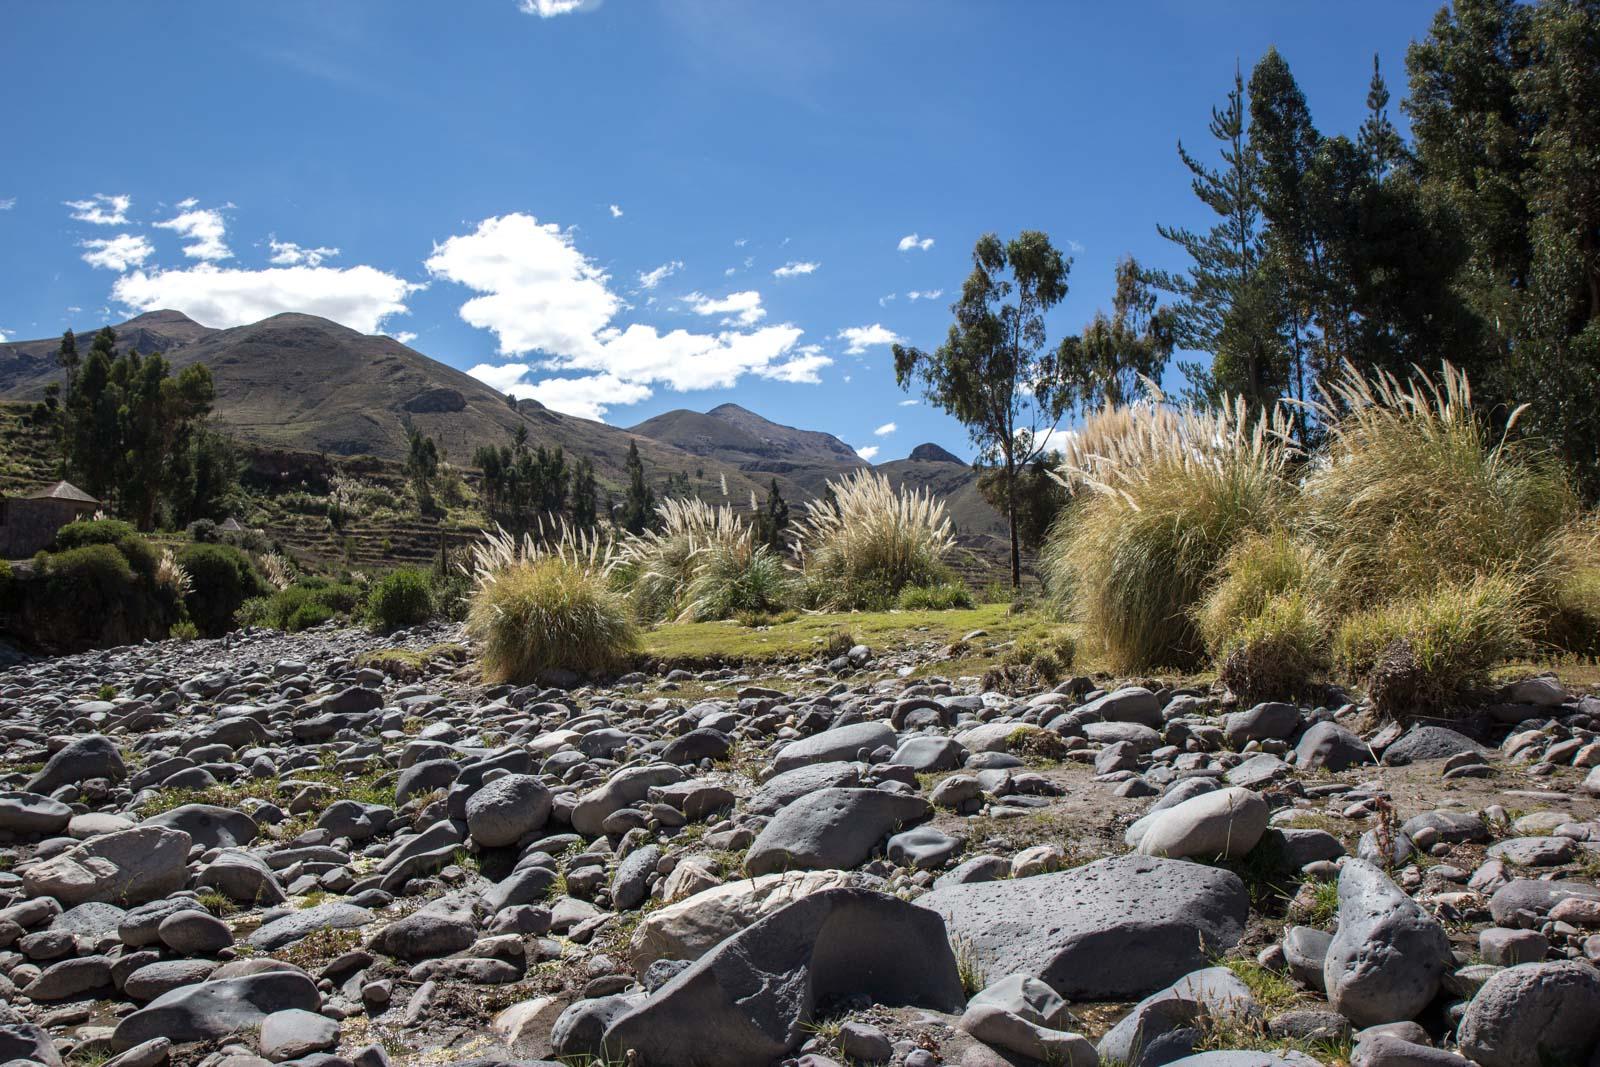 Visiting Colca Canyon, Peru